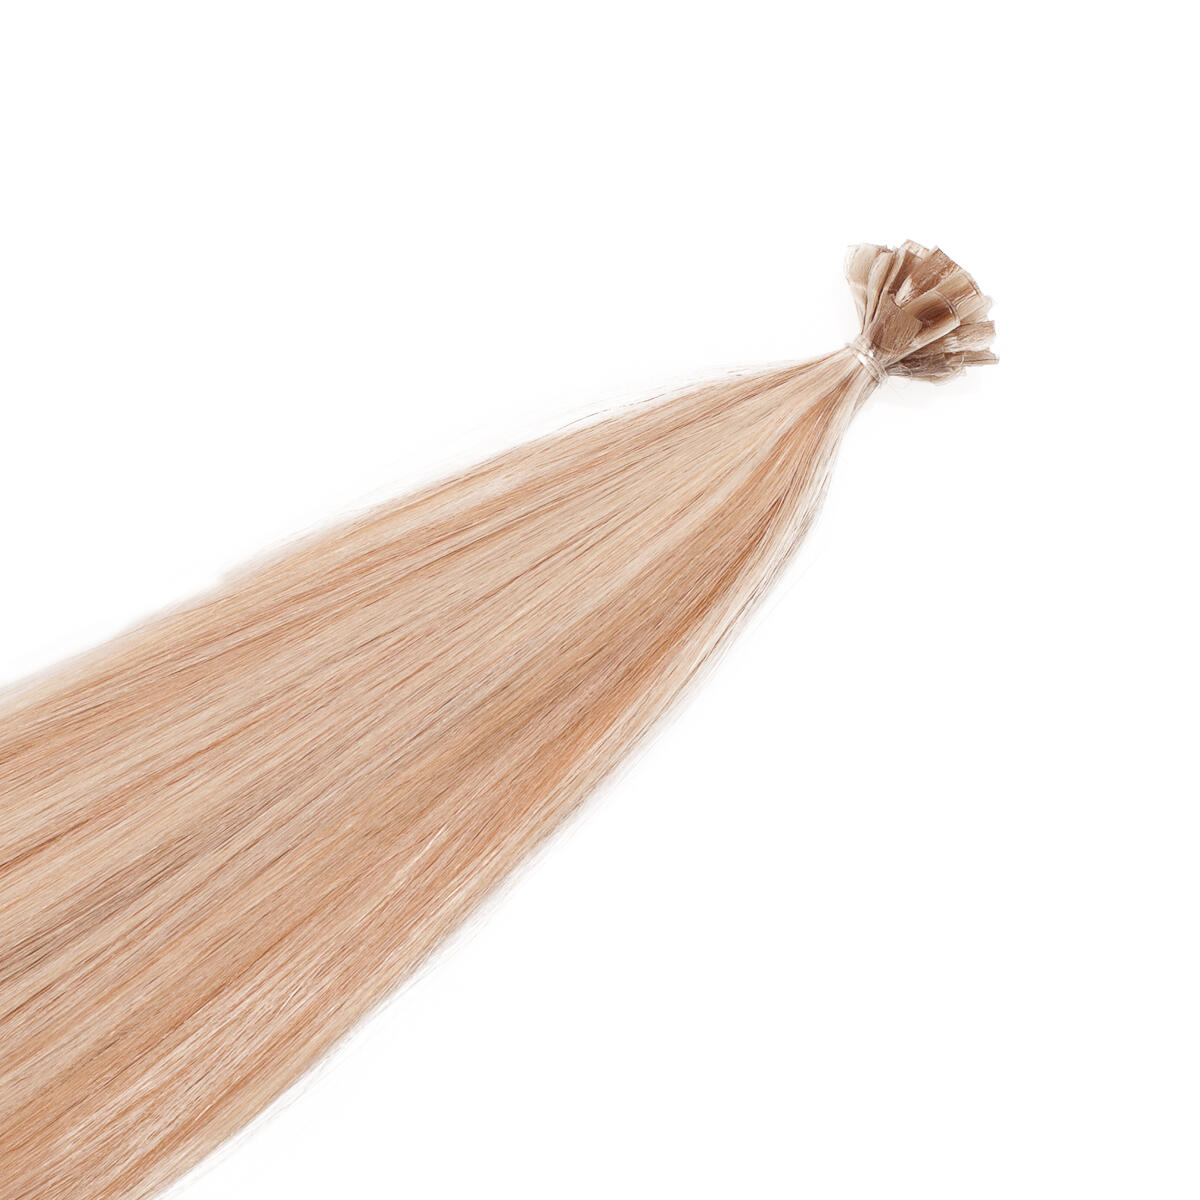 Bondings Premium Glatt M22 Chad Wood Blond Mix 50 cm